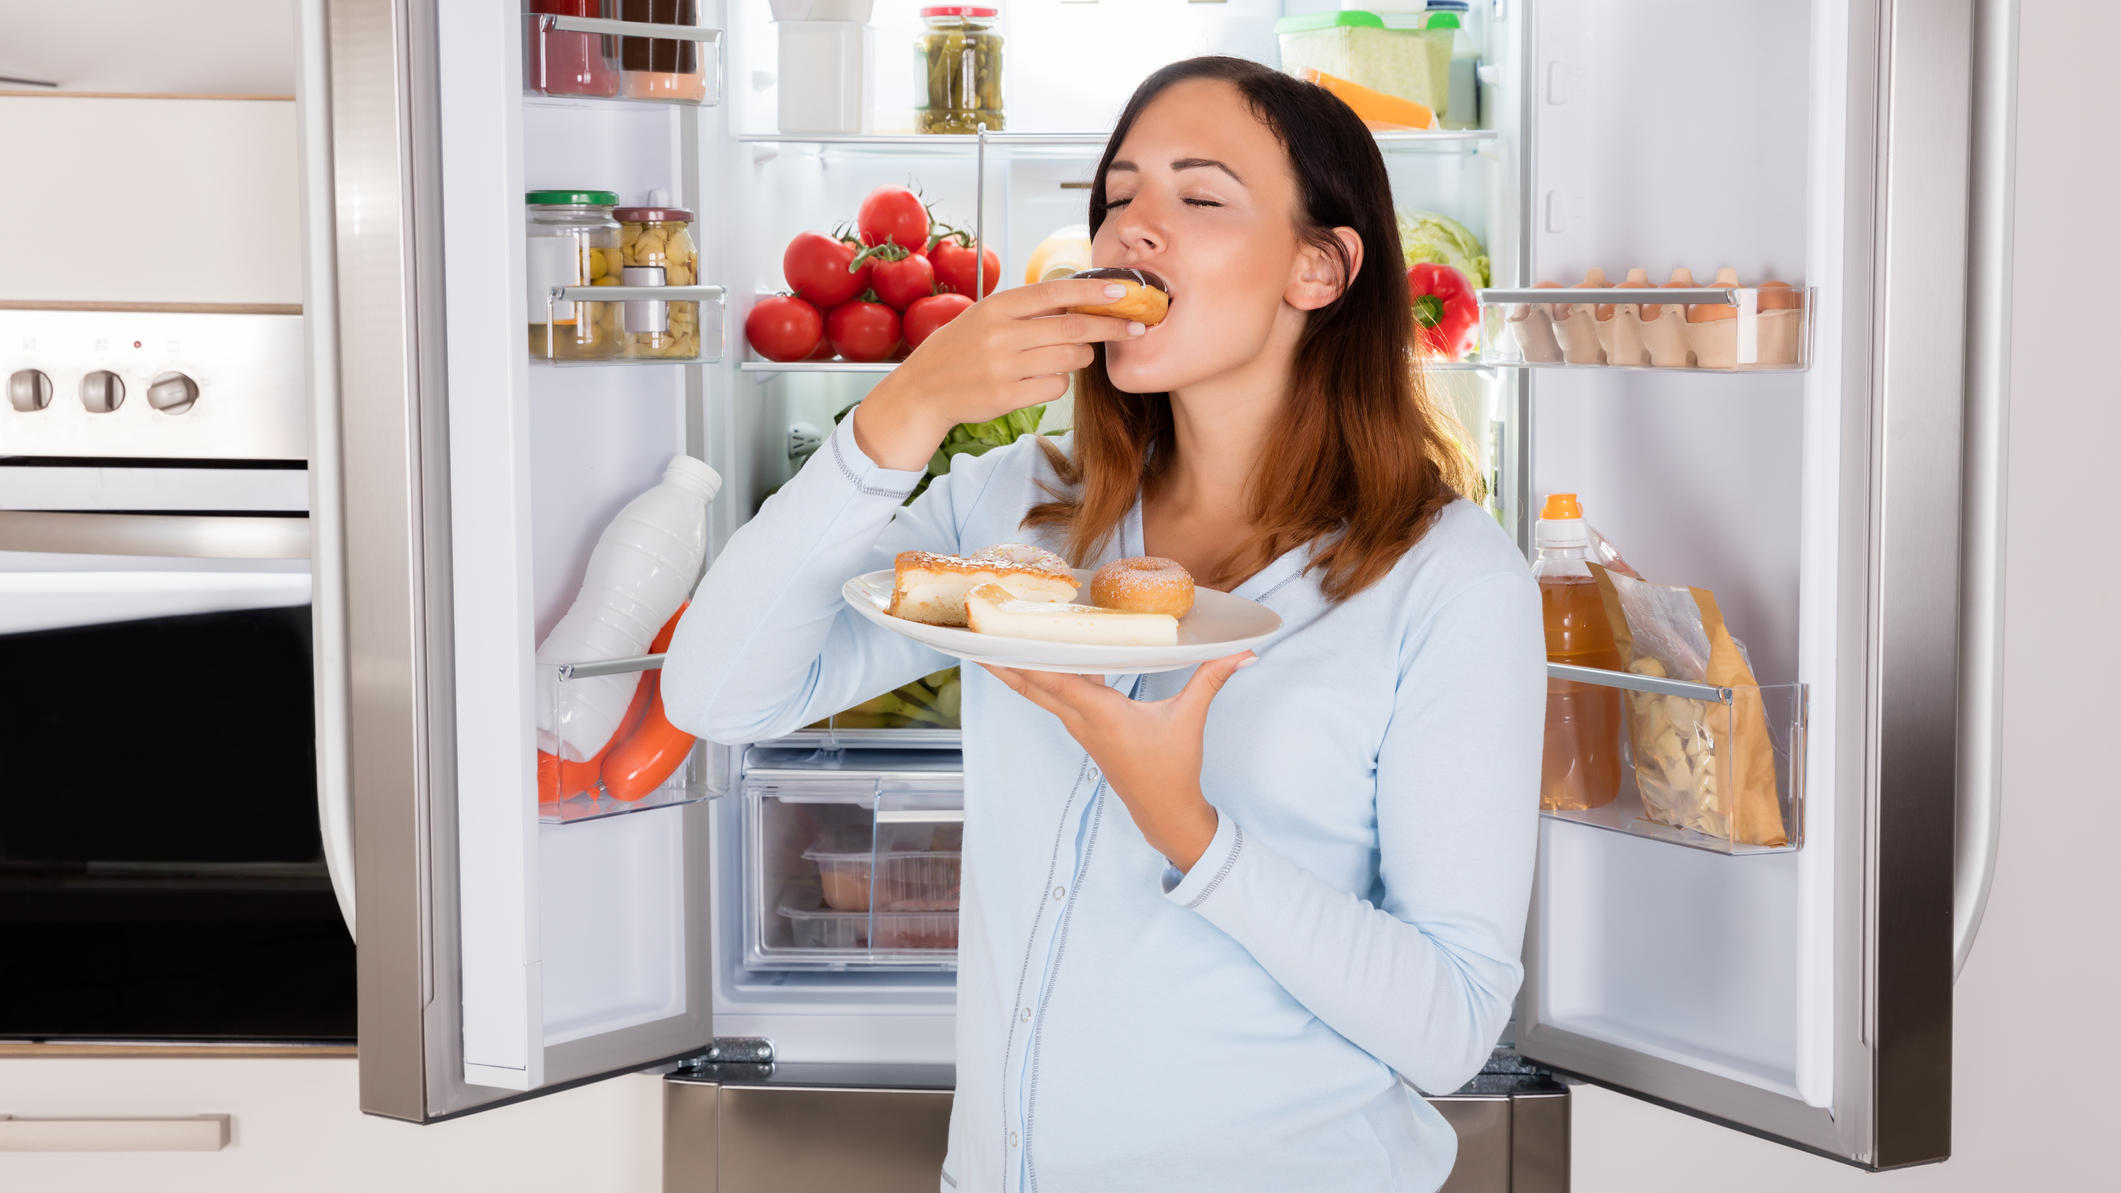 Frau isst vorm geöffneten Kühlschrank